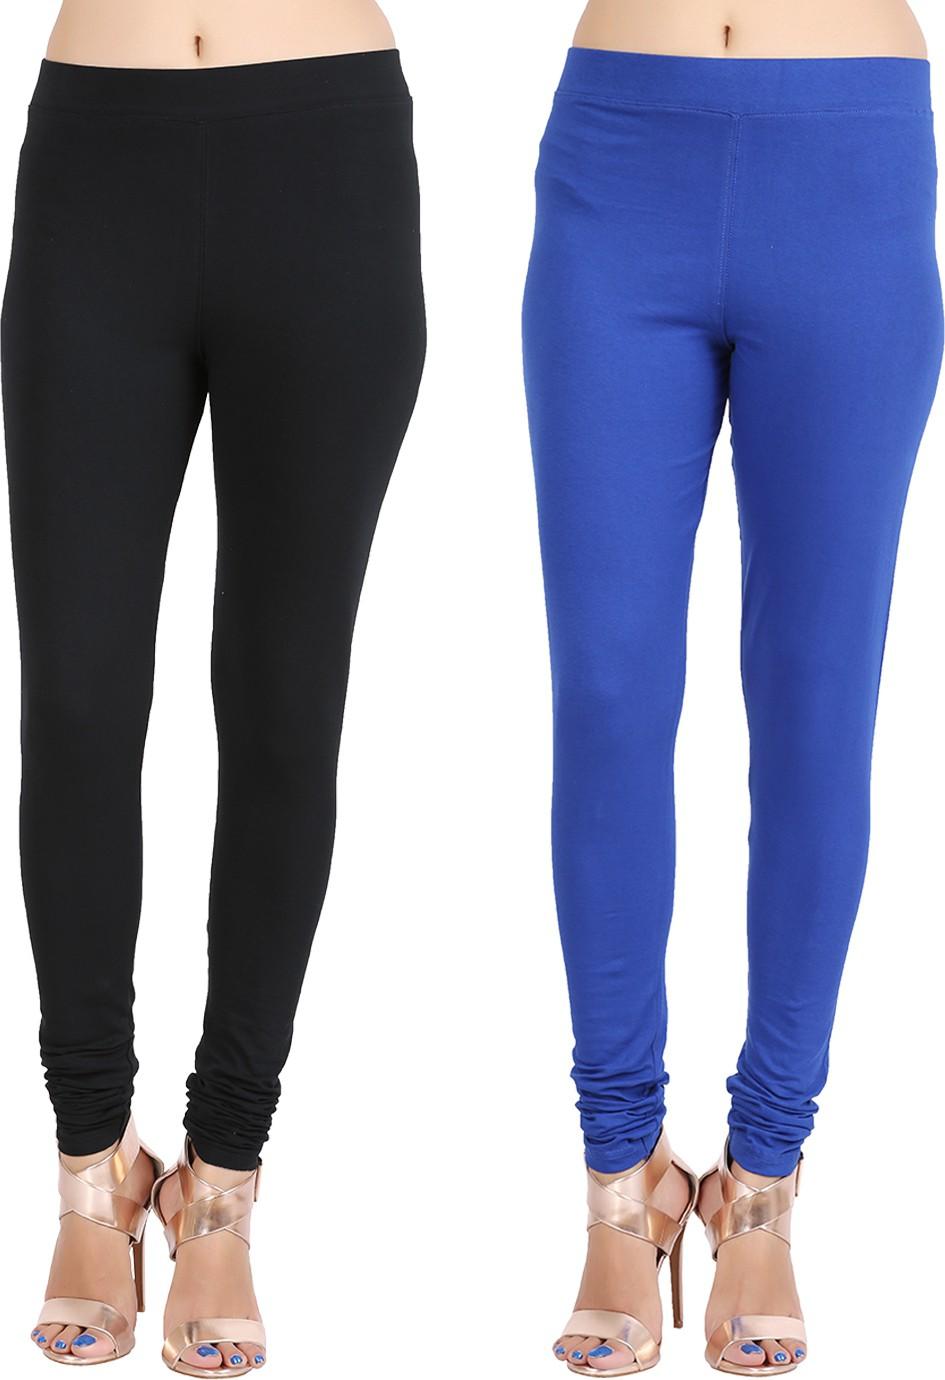 Lula Ms Womens Black, Dark Blue Leggings(Pack of 2)